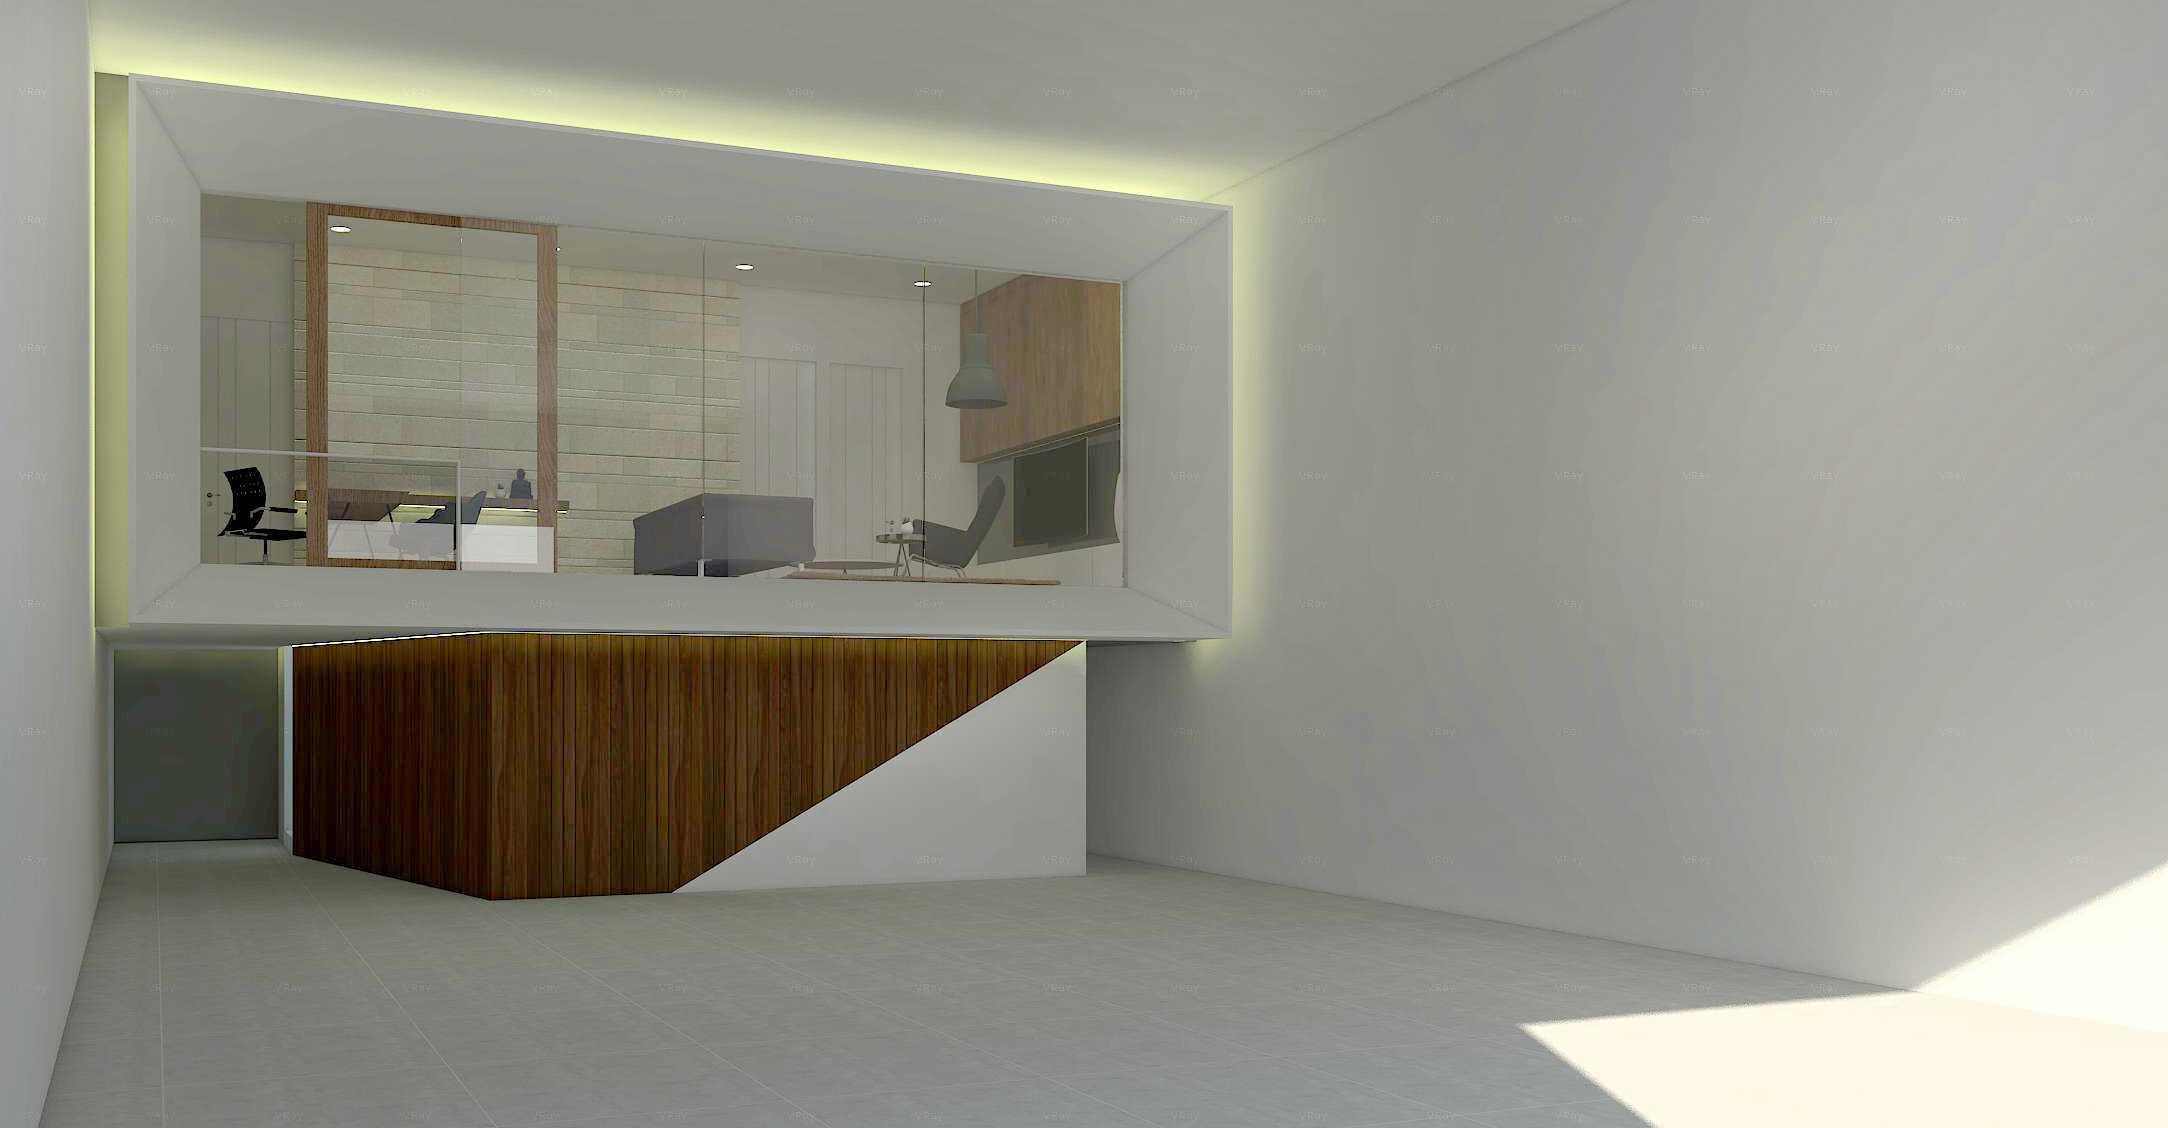 Han Architect Jm Office Pontianak Pontianak Office-3   28402